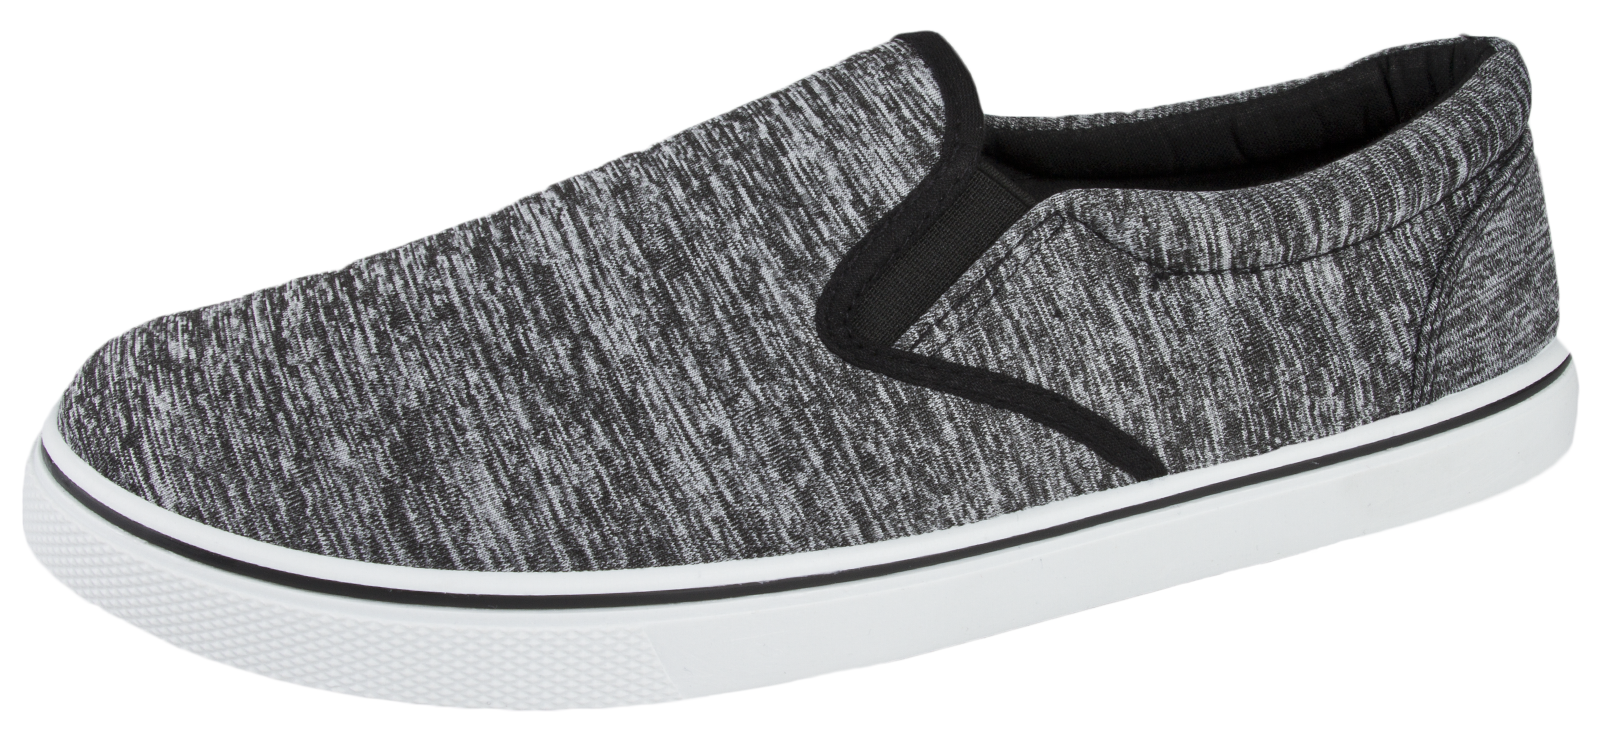 Mens-Canvas-Plimsolls-Slip-On-Flat-Pumps-Trainers-Casual-Gym-Shoes-Boys-Size